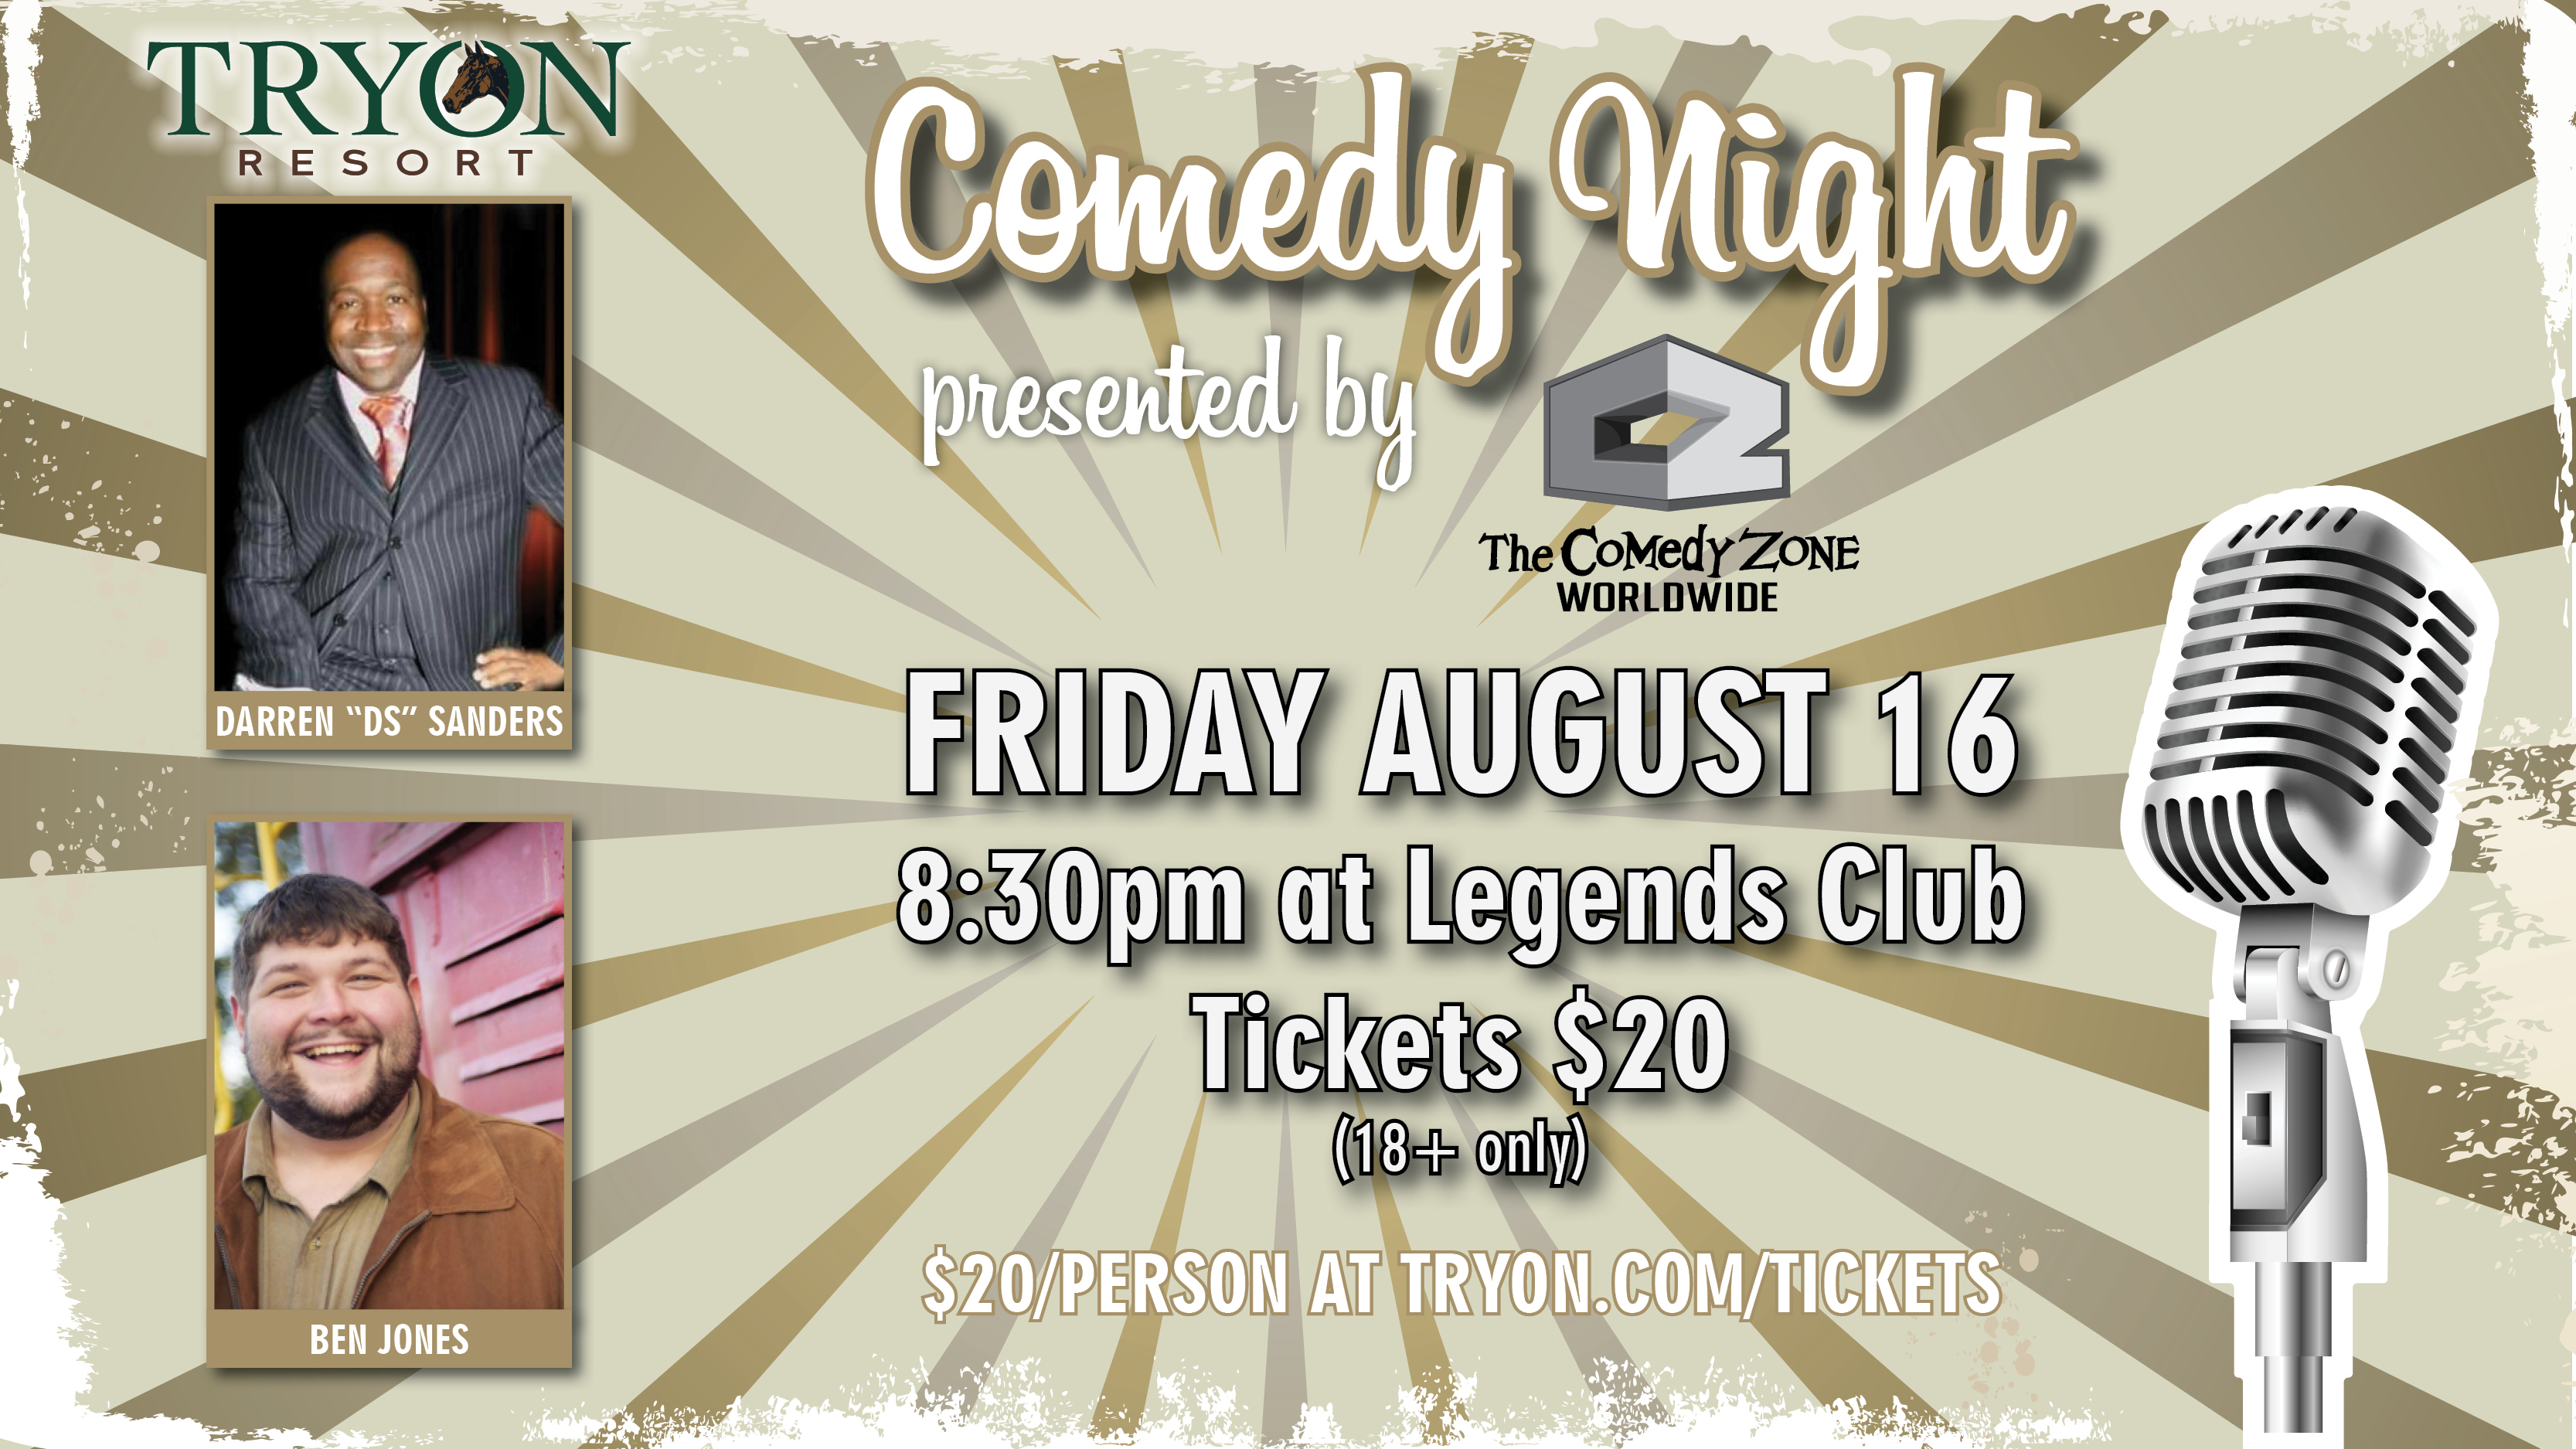 Spring Comedy Night Webslider_August 16